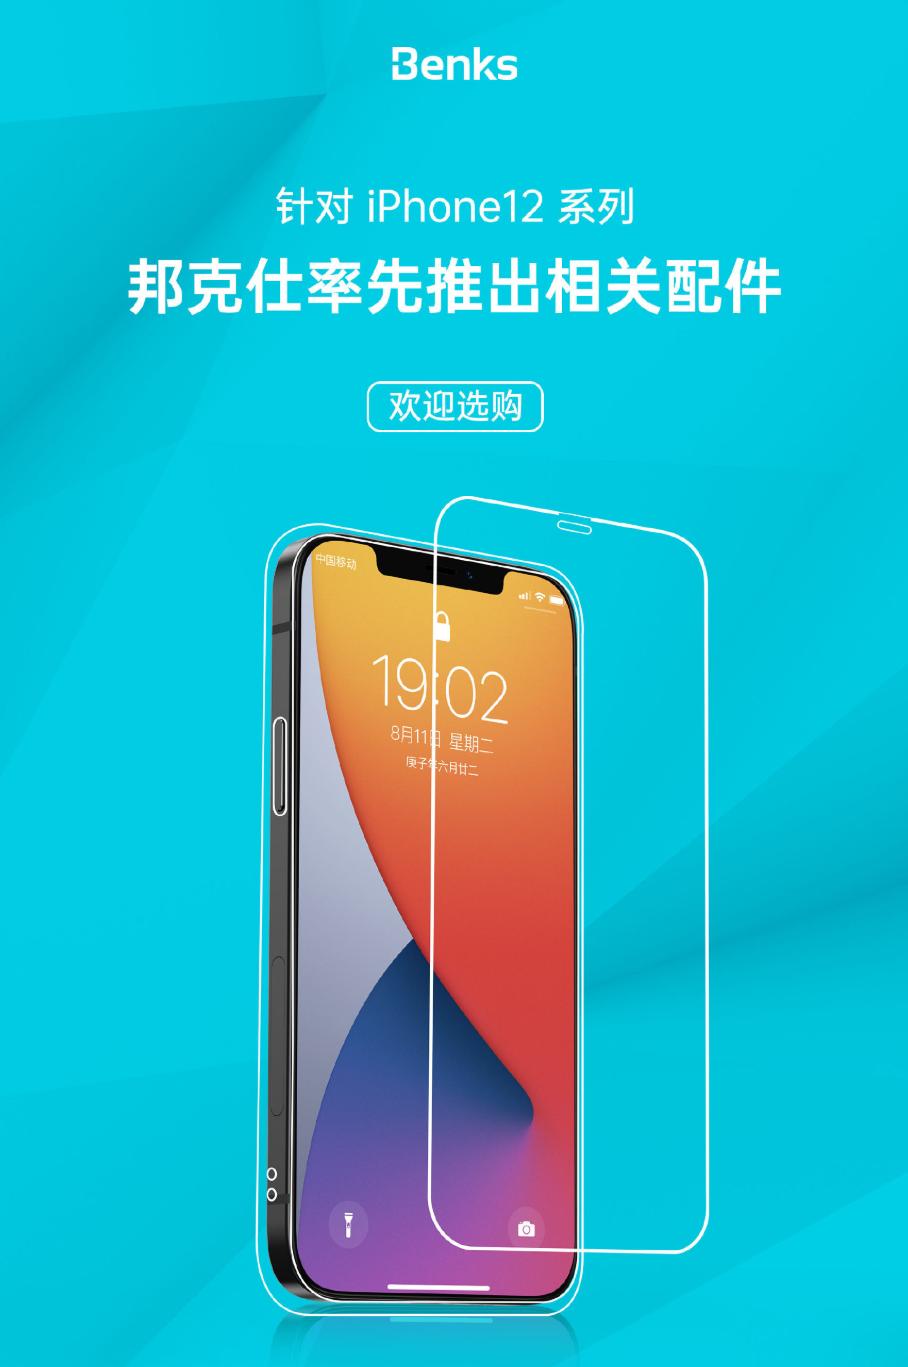 iPhone 12 长这样?配件厂商放出 iPhone 12 配件海报 - 热点资讯 家电百科 第1张